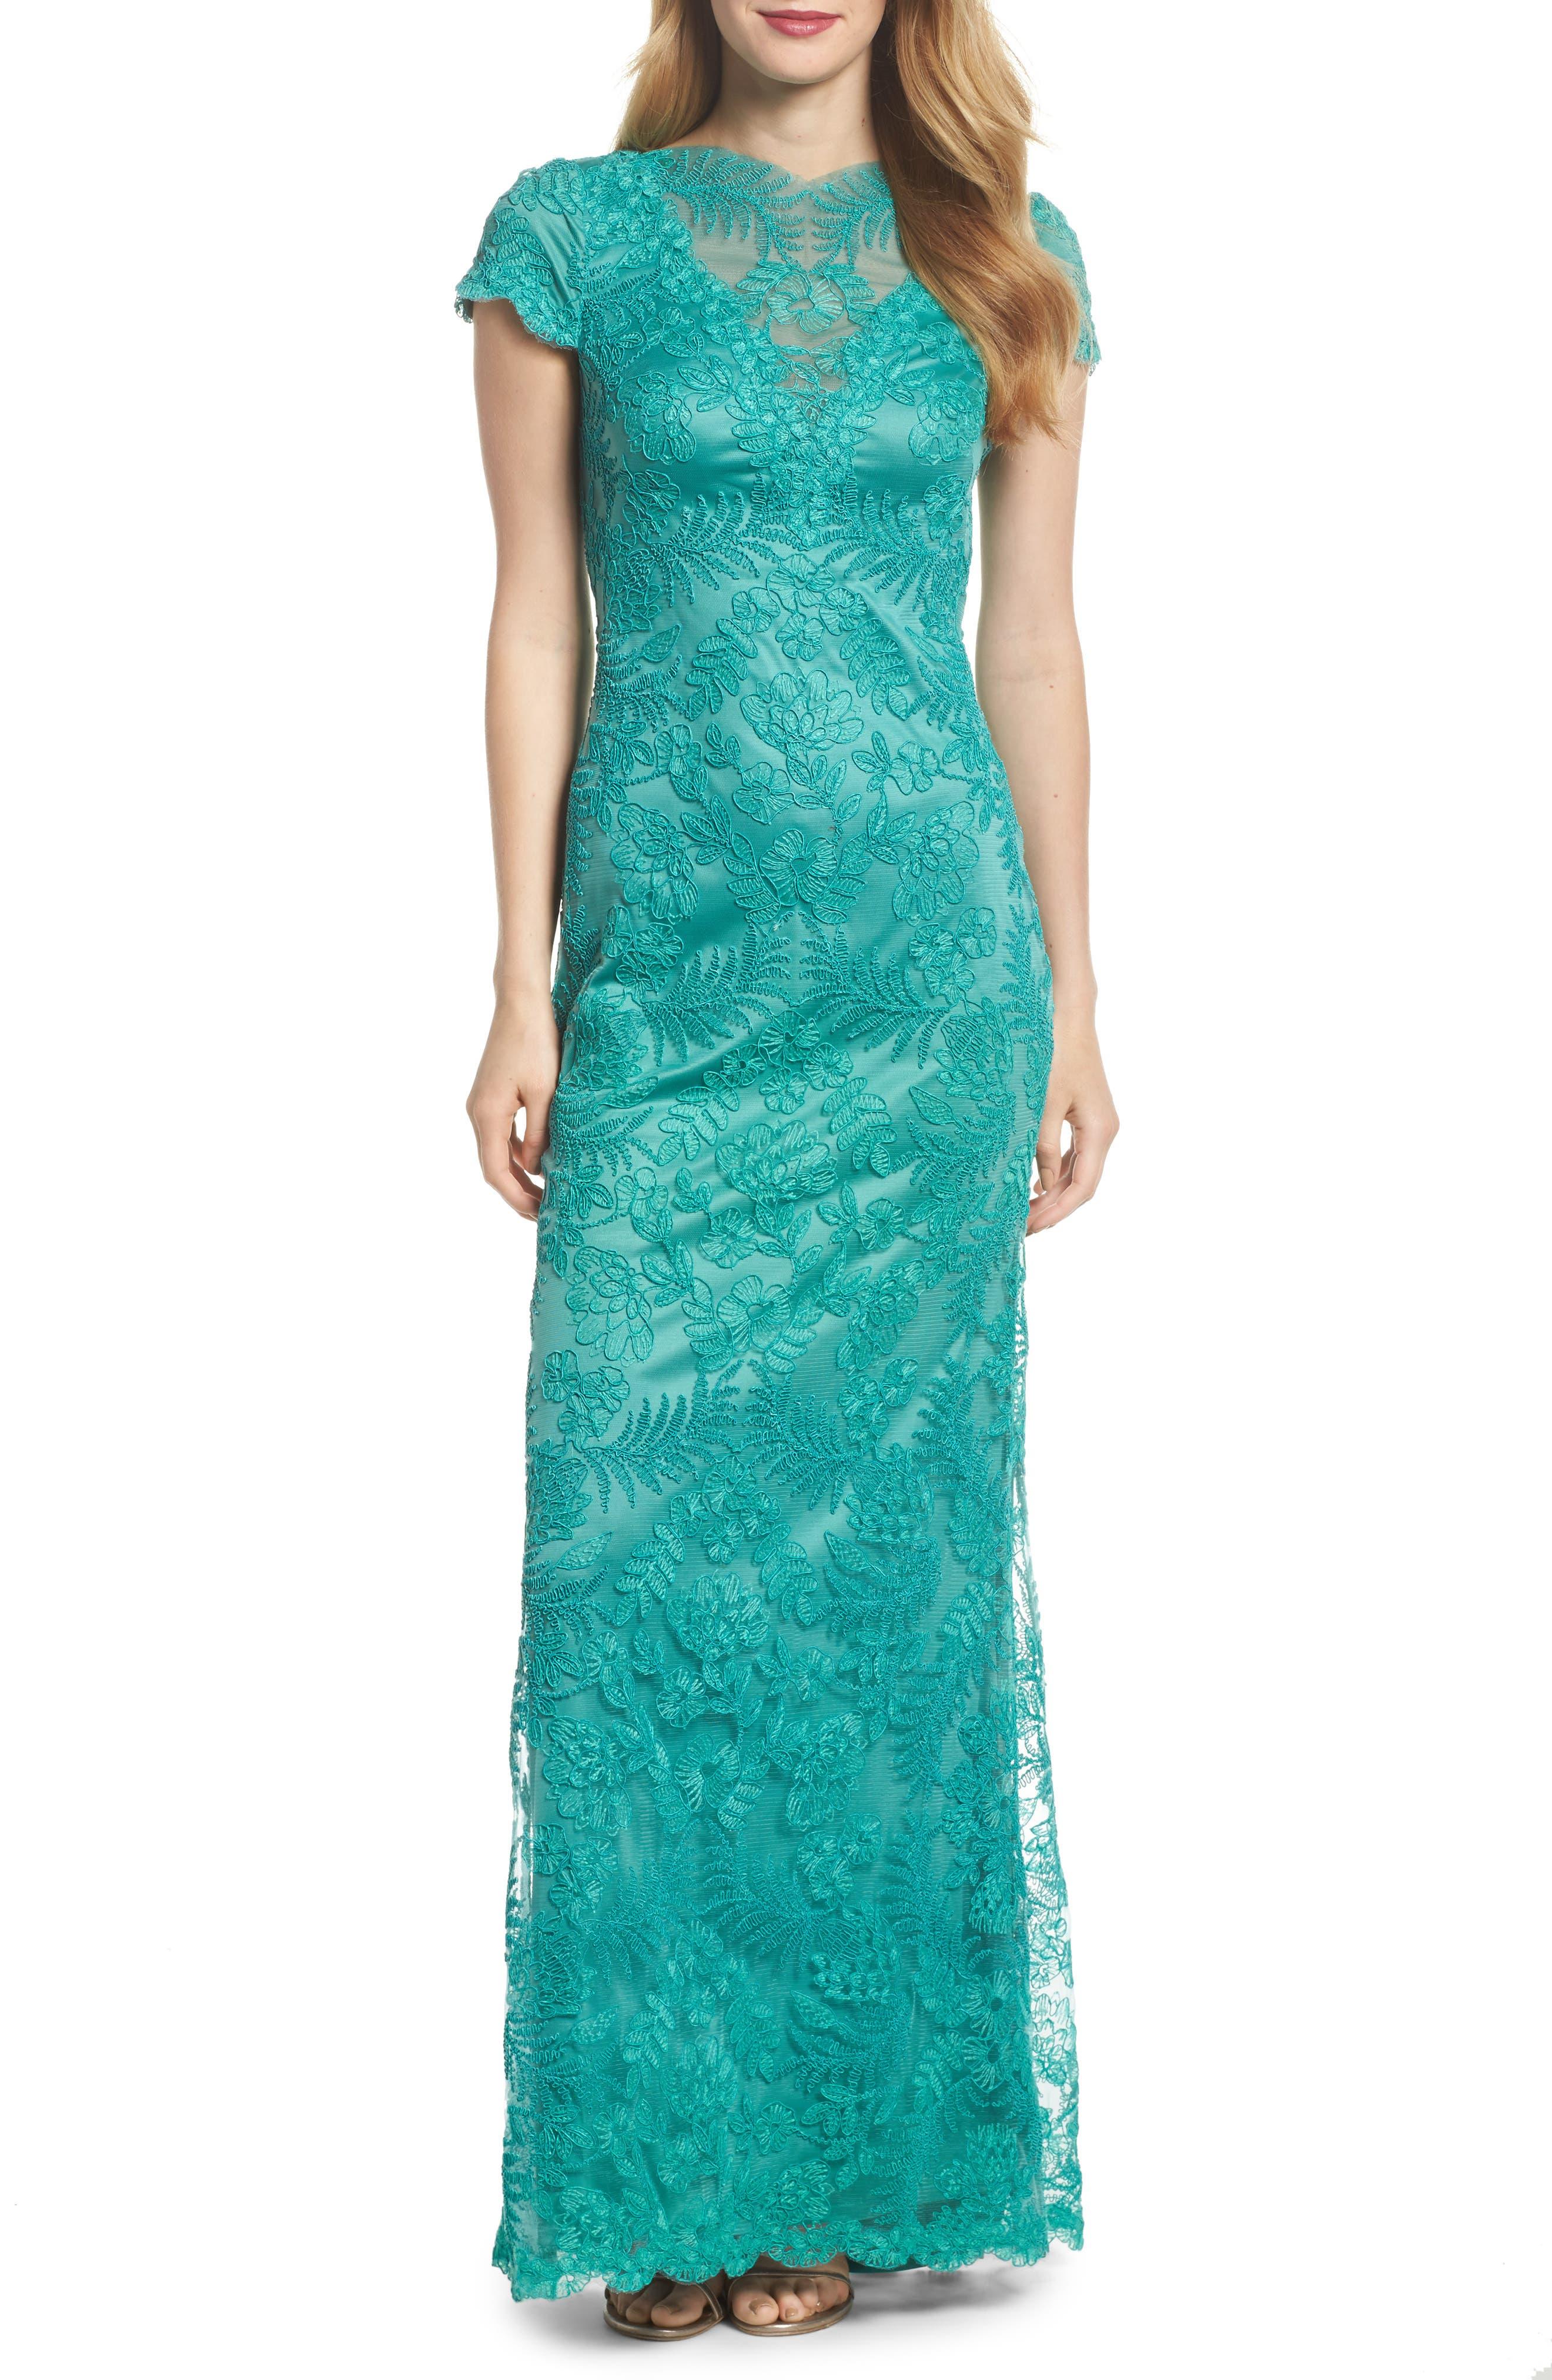 Tadashi Shoji Blue Dress